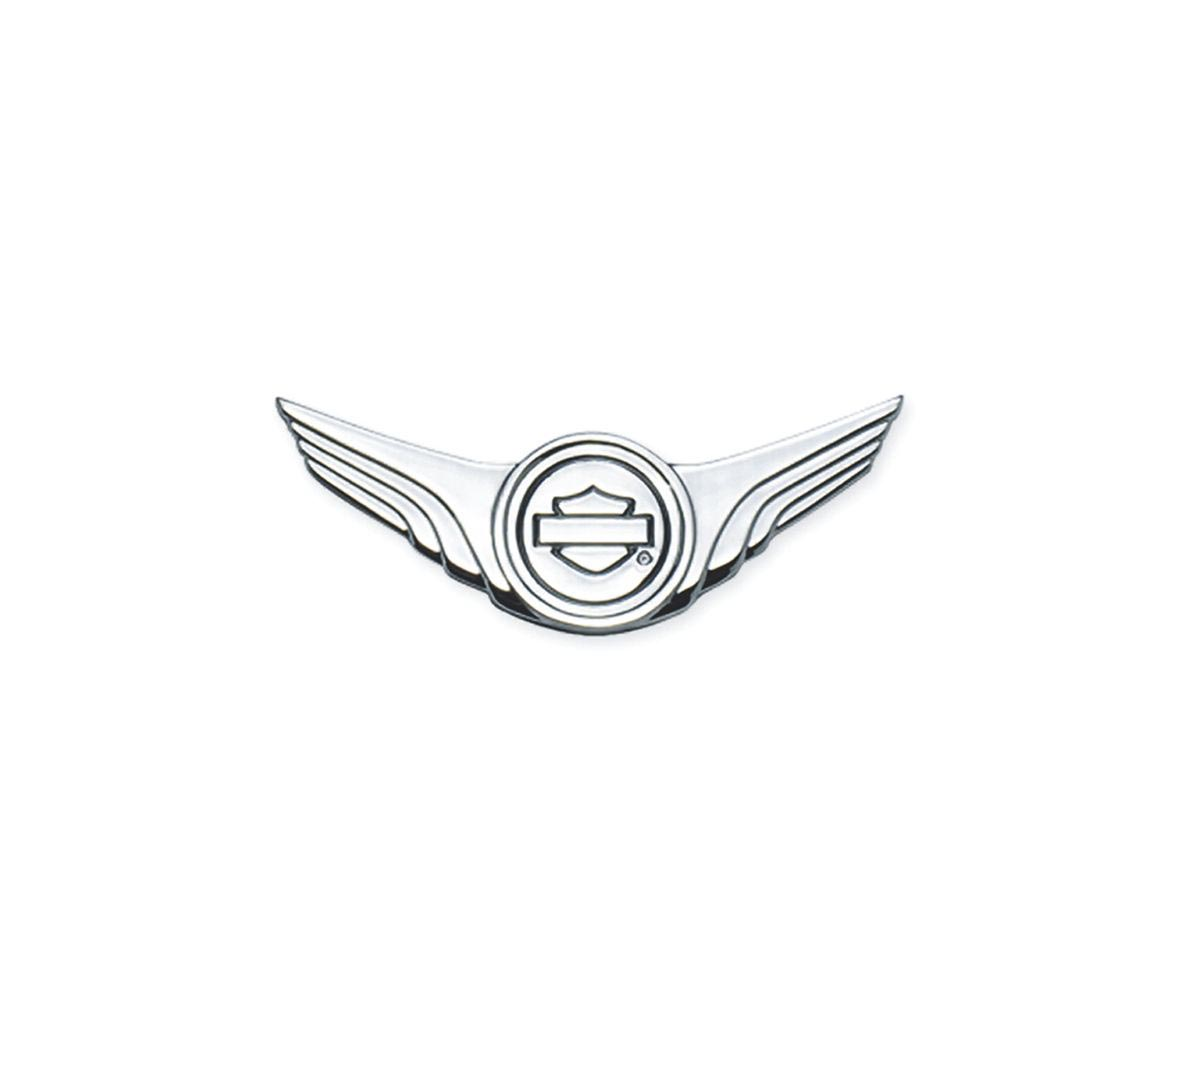 91745 02 h d bar shield wings medaillon chrome 4 x 15 harley davidson decorative bar shield logo wings medallion 4 x 15 biocorpaavc